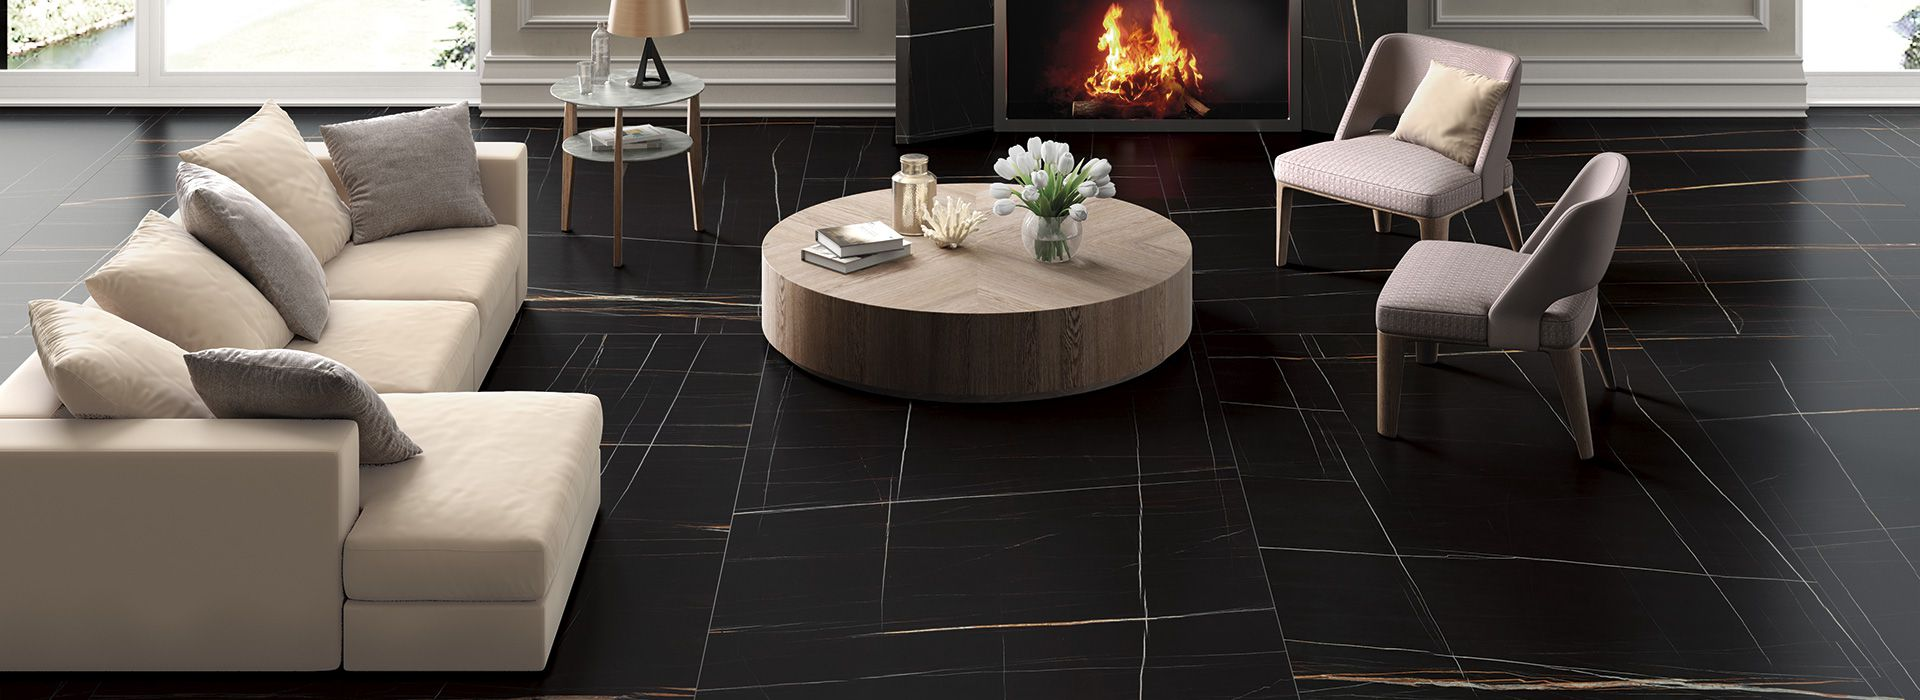 Sahara Noir Marmi Black Marble Effect Porcelain Tiles